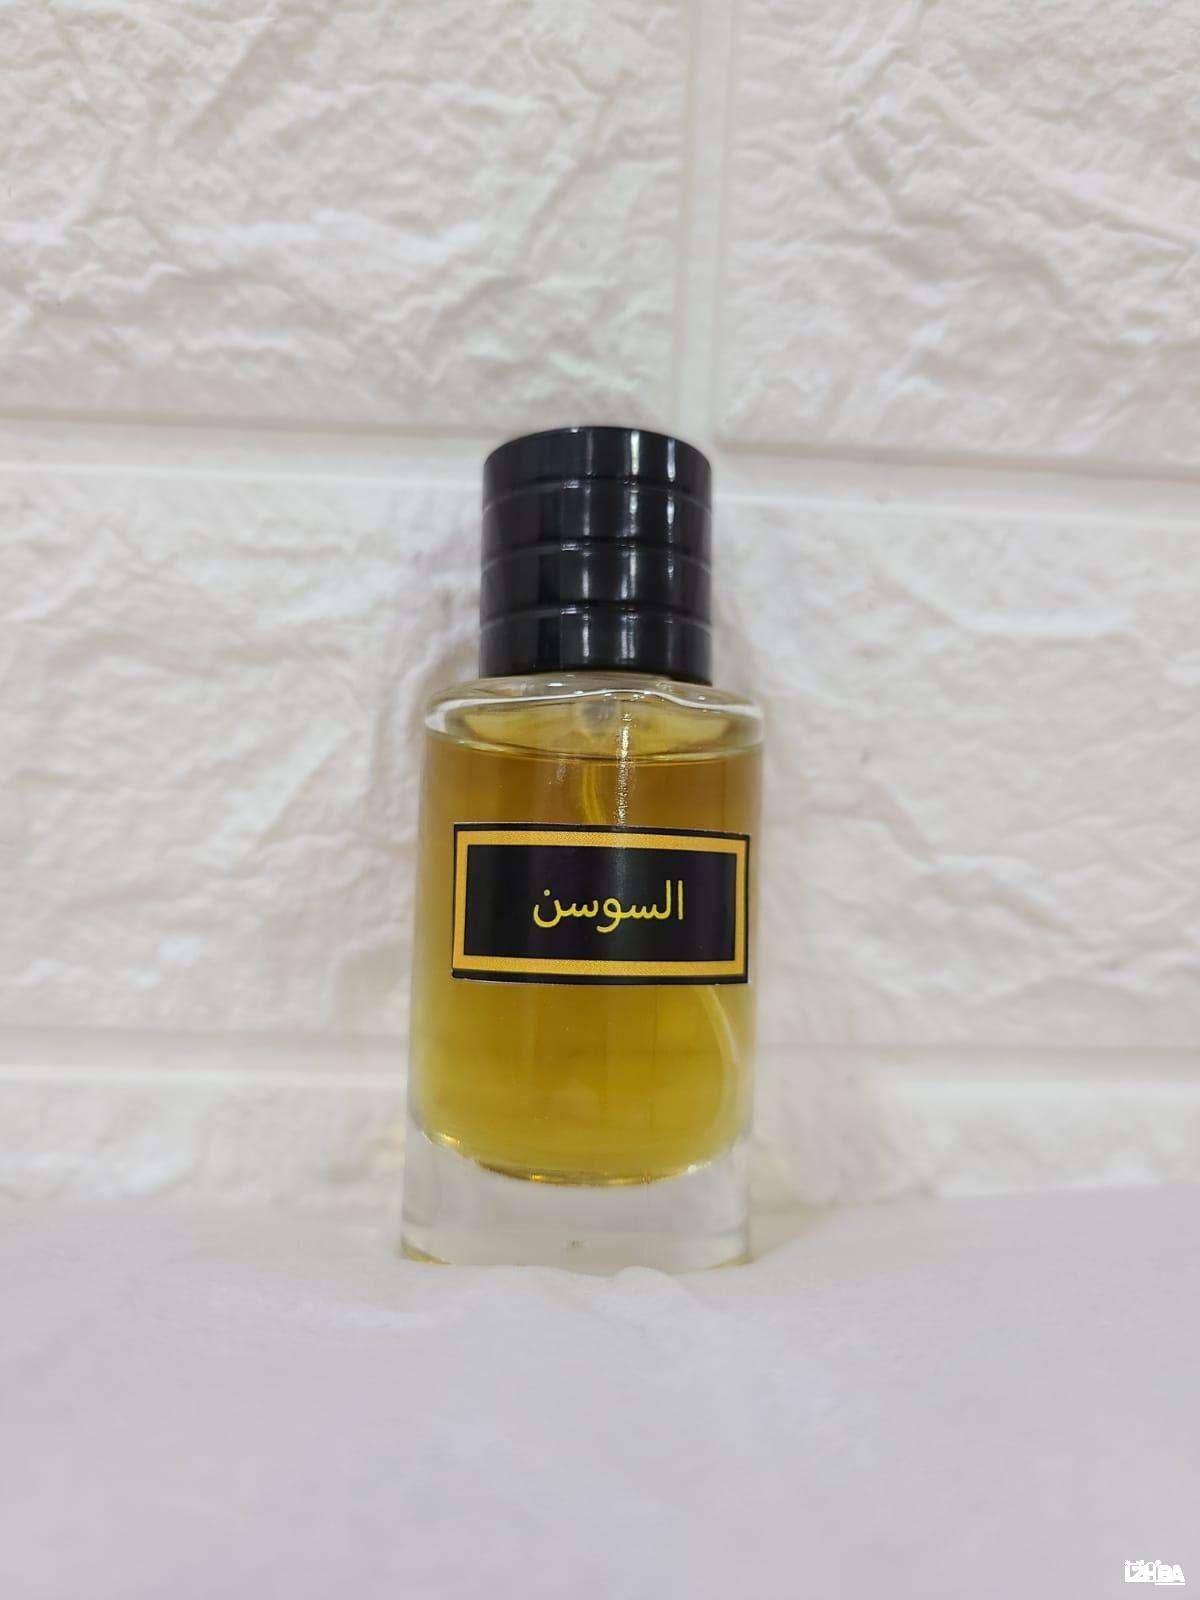 Alsaosan Perfume